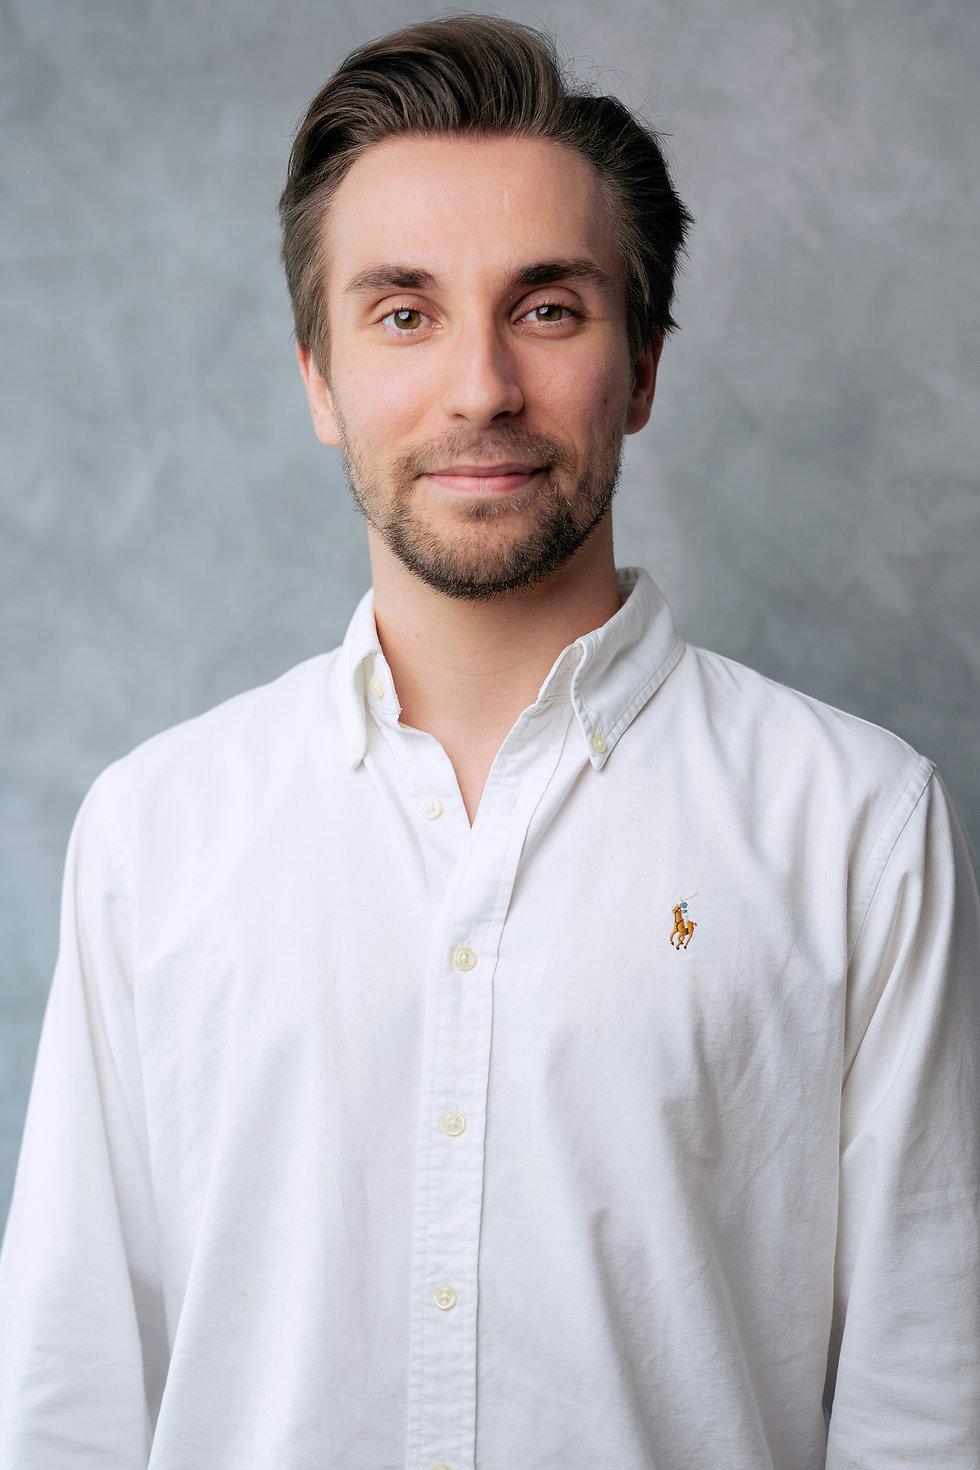 Philipp K. Helfried